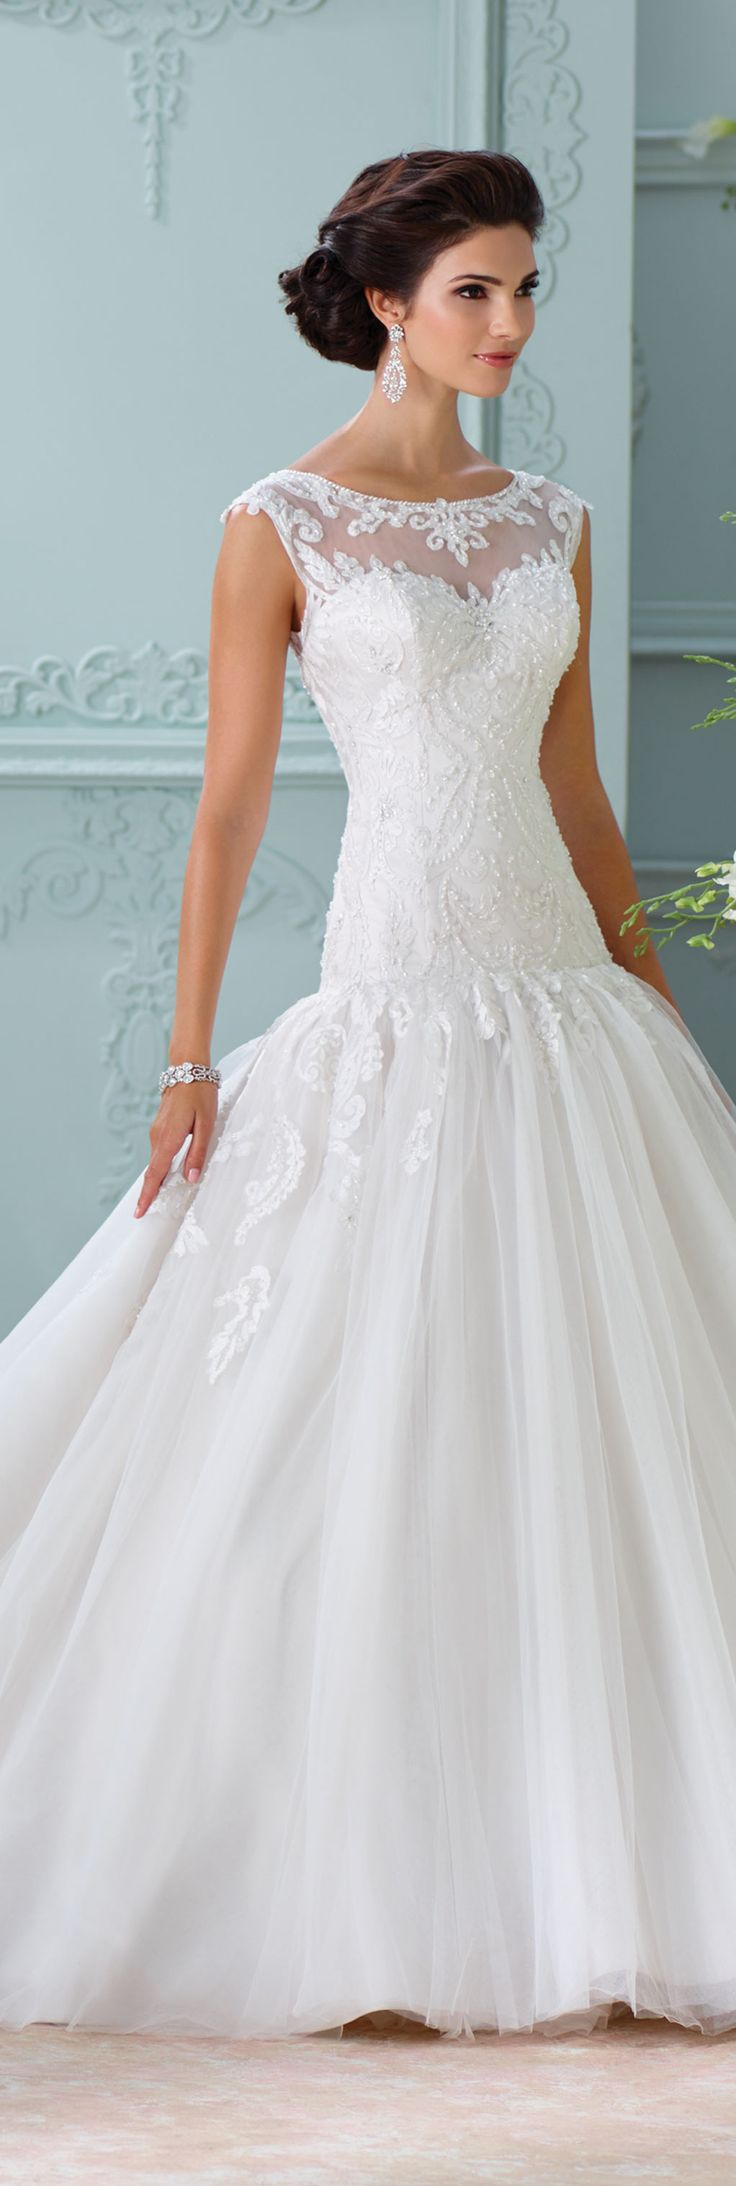 The David Tutera for Mon Cheri Spring 2016 Wedding Gown Collection - Style No. 116226 Chiara #weddingdresseswithsleeves